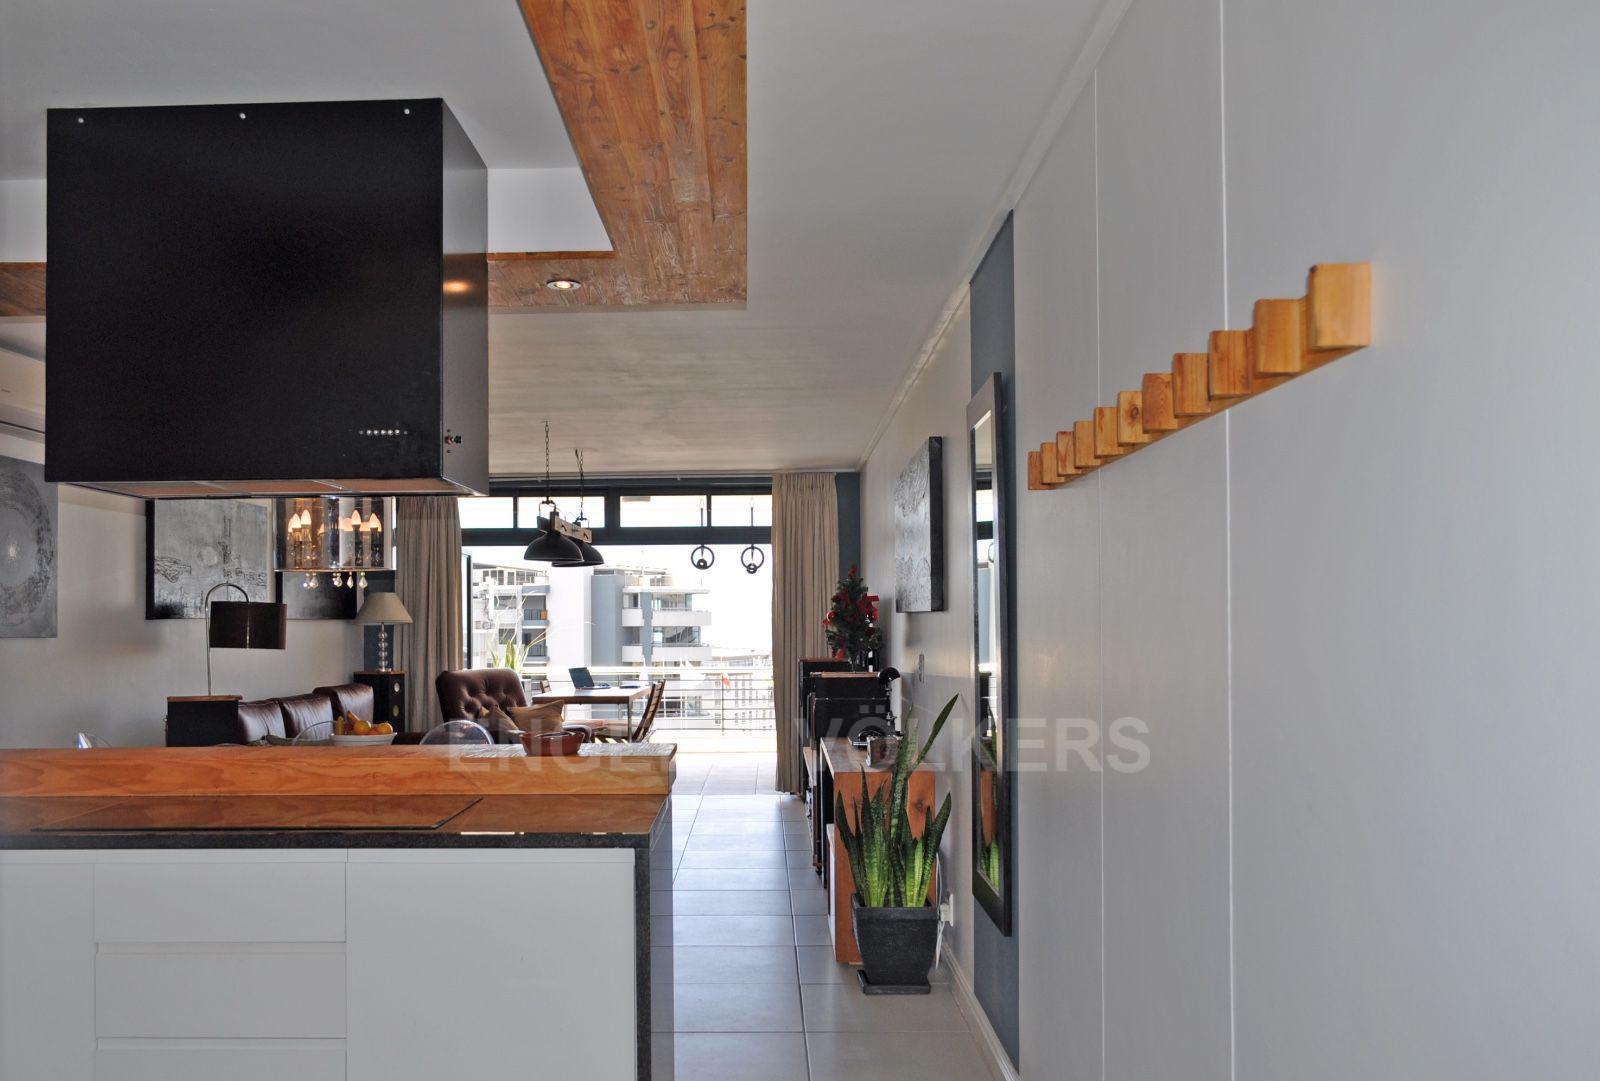 De Waterkant property for sale. Ref No: 13450081. Picture no 15